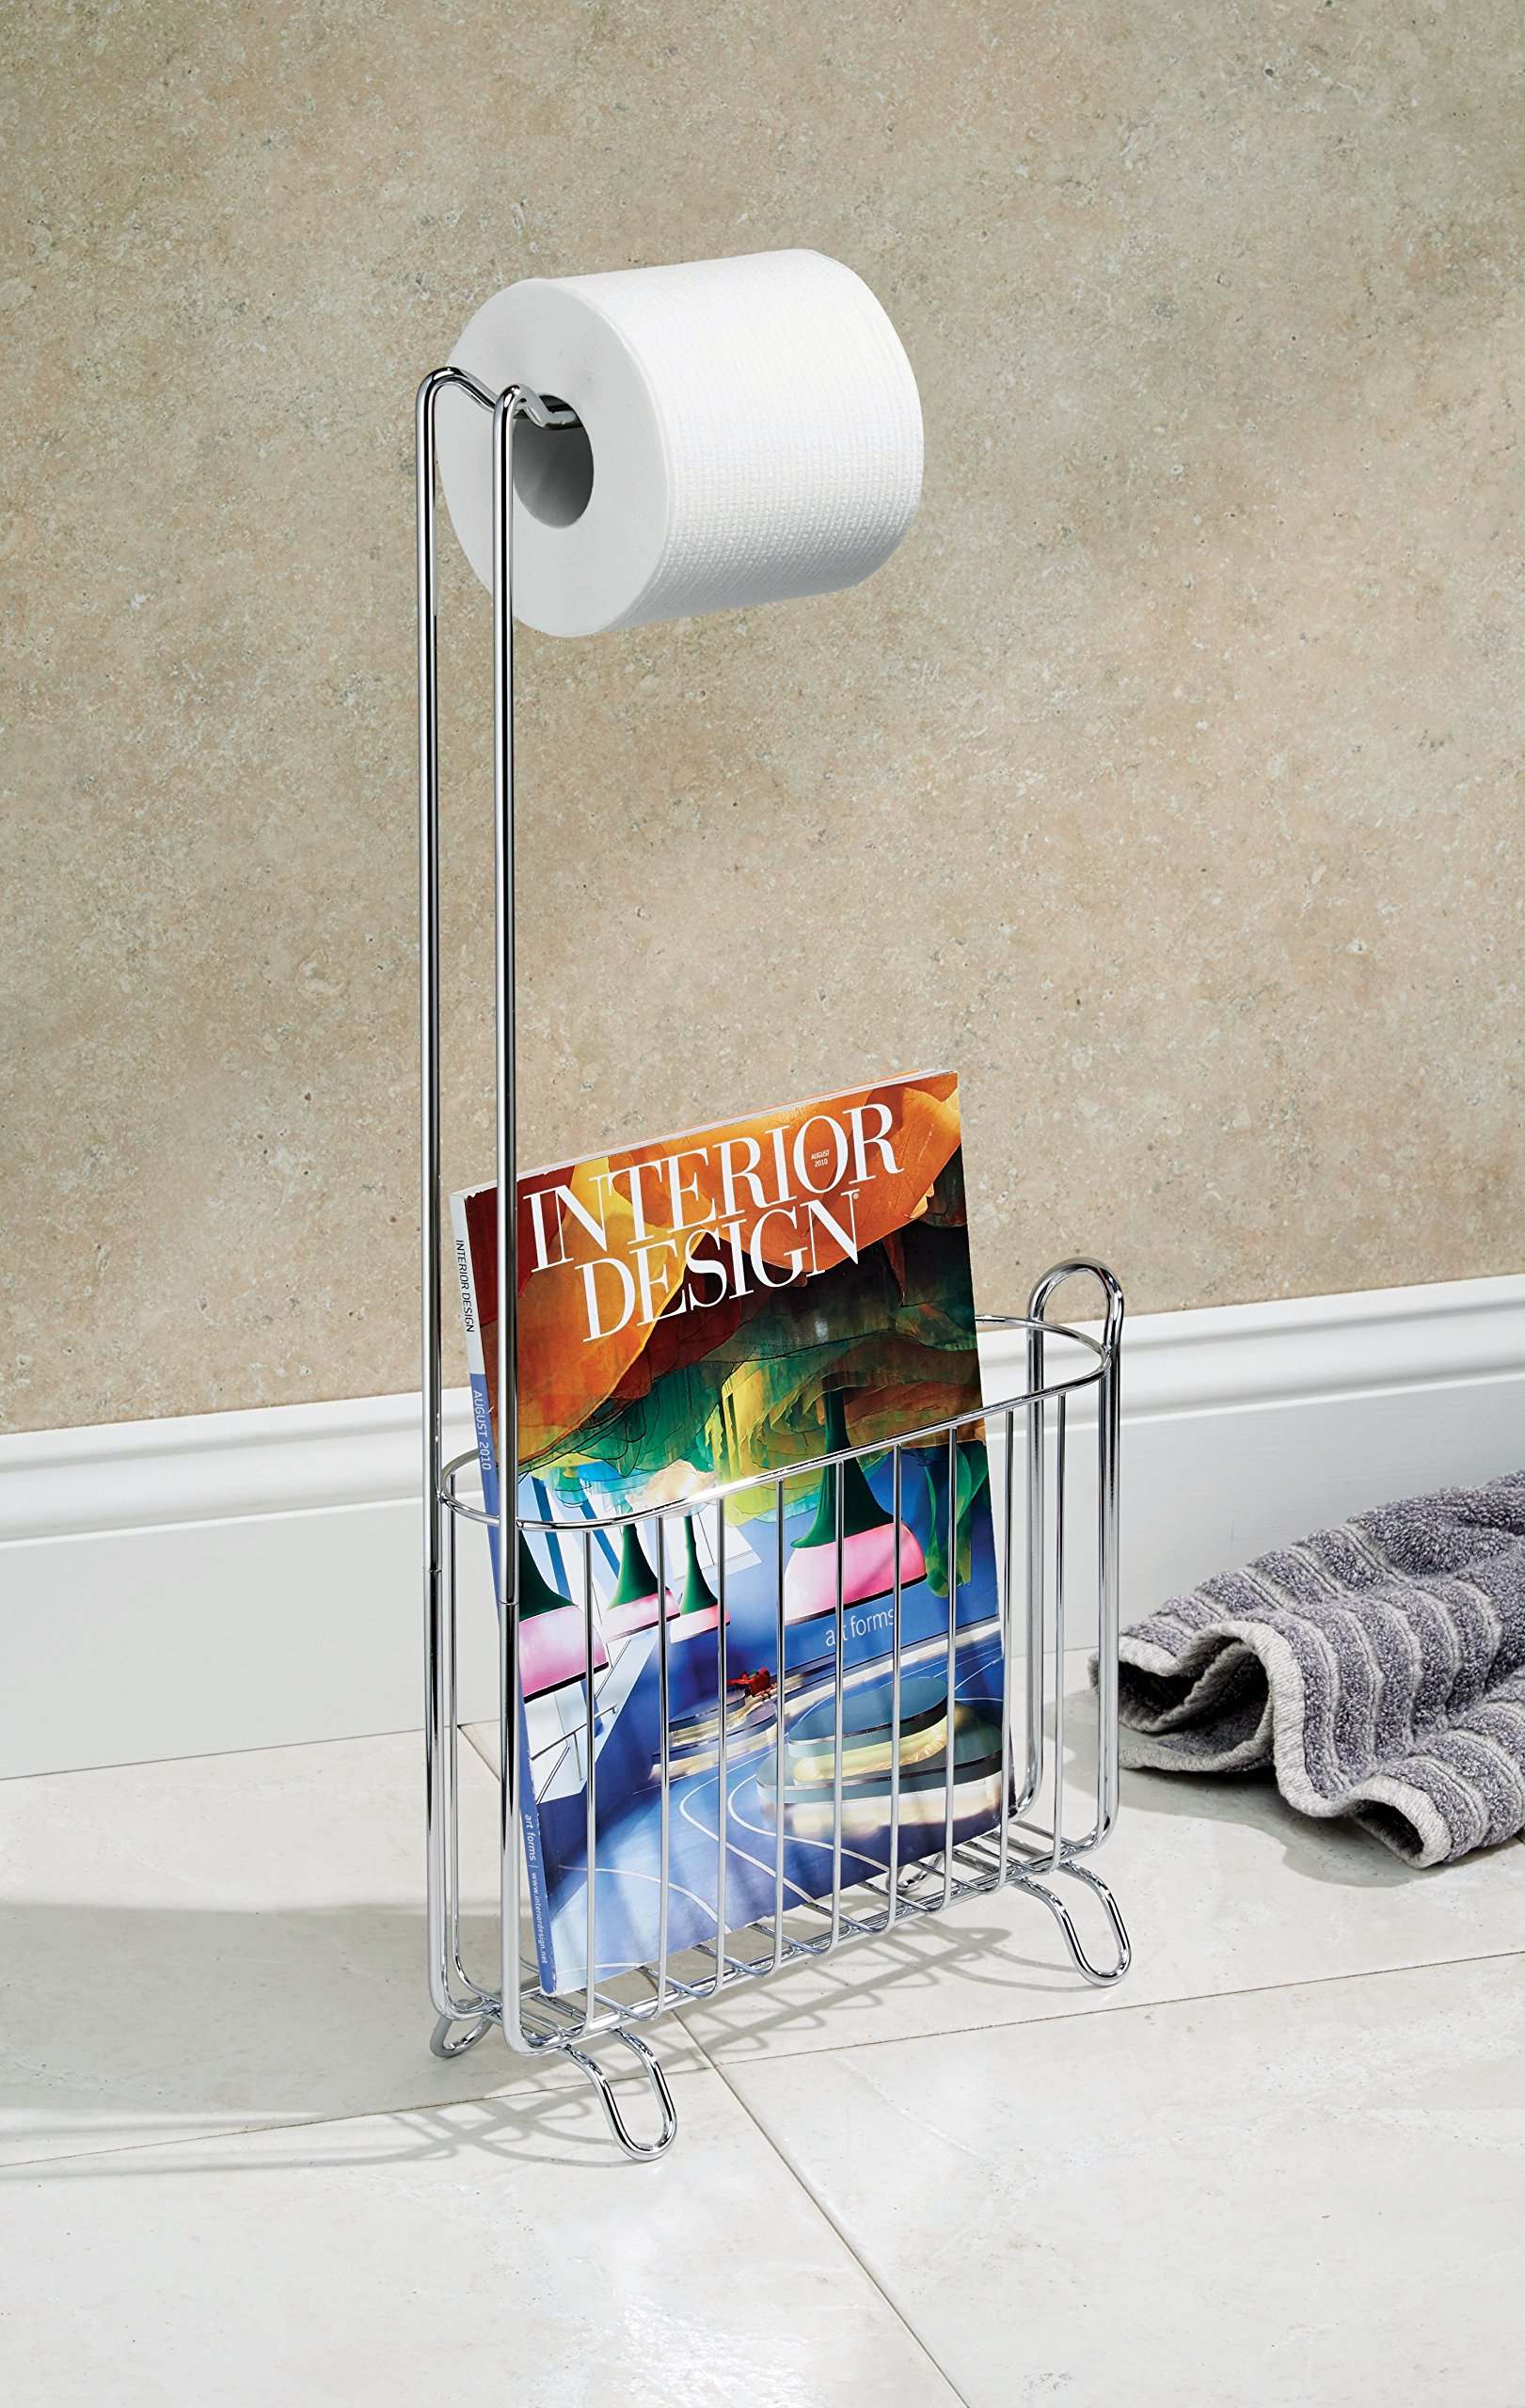 InterDesign Classico Free-Standing Toilet Paper Holder and Magazine Rack –Bathroom Organizer - Chrome